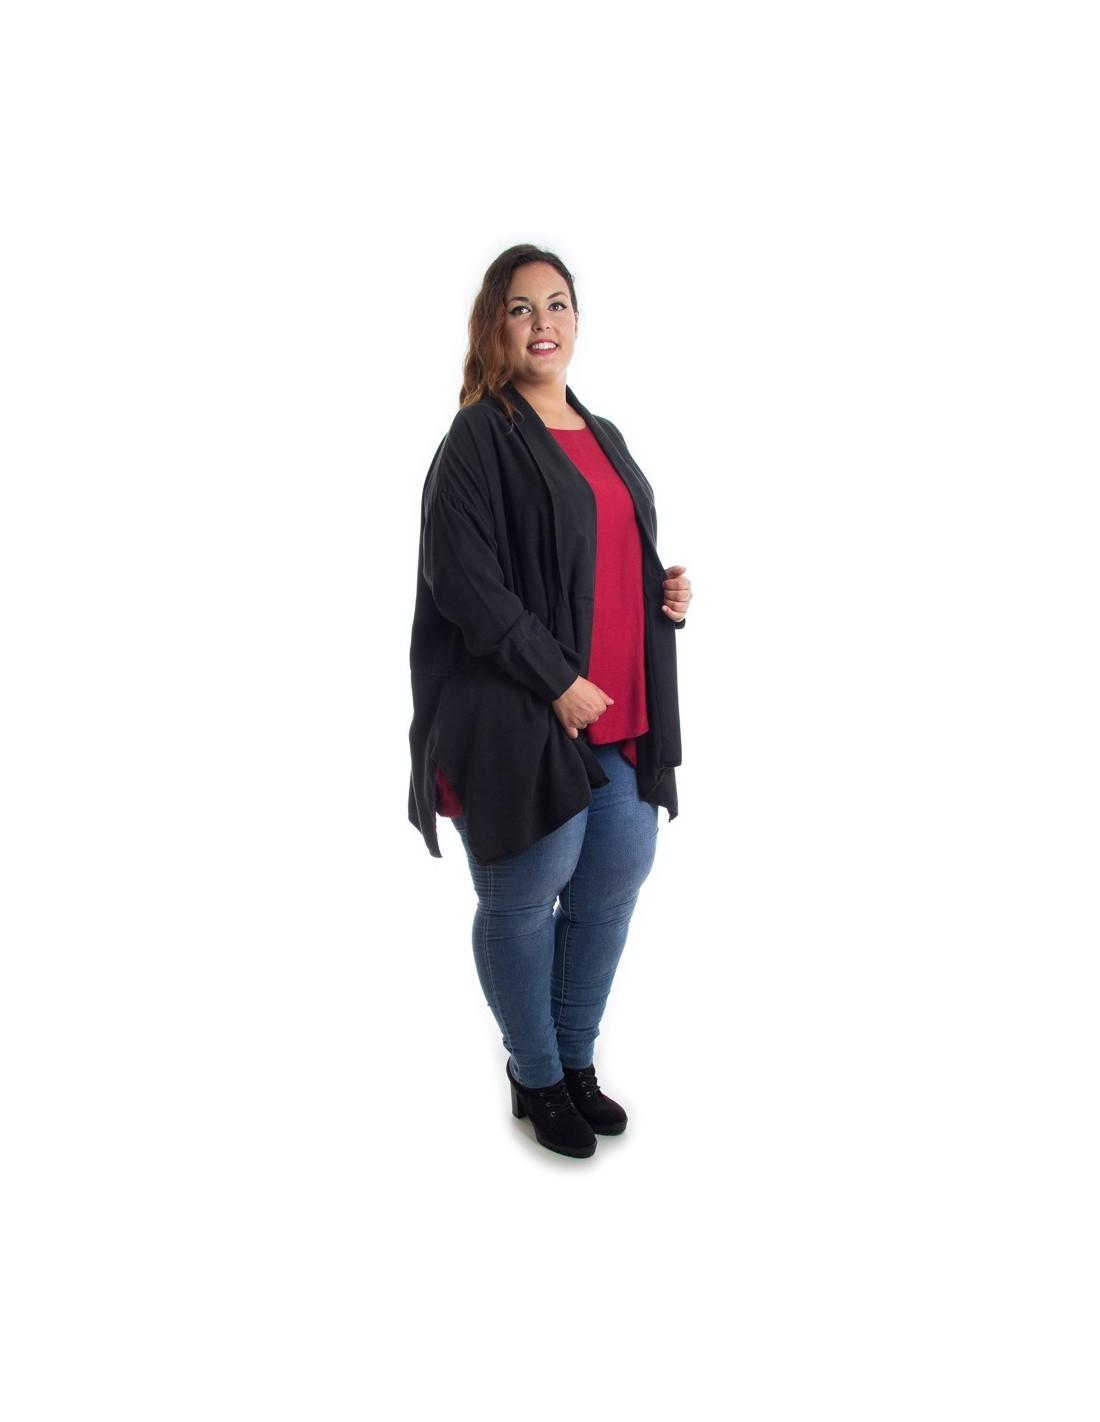 Comprar Americana Oversized Negra Para Mujer En Tallas Grandes Online